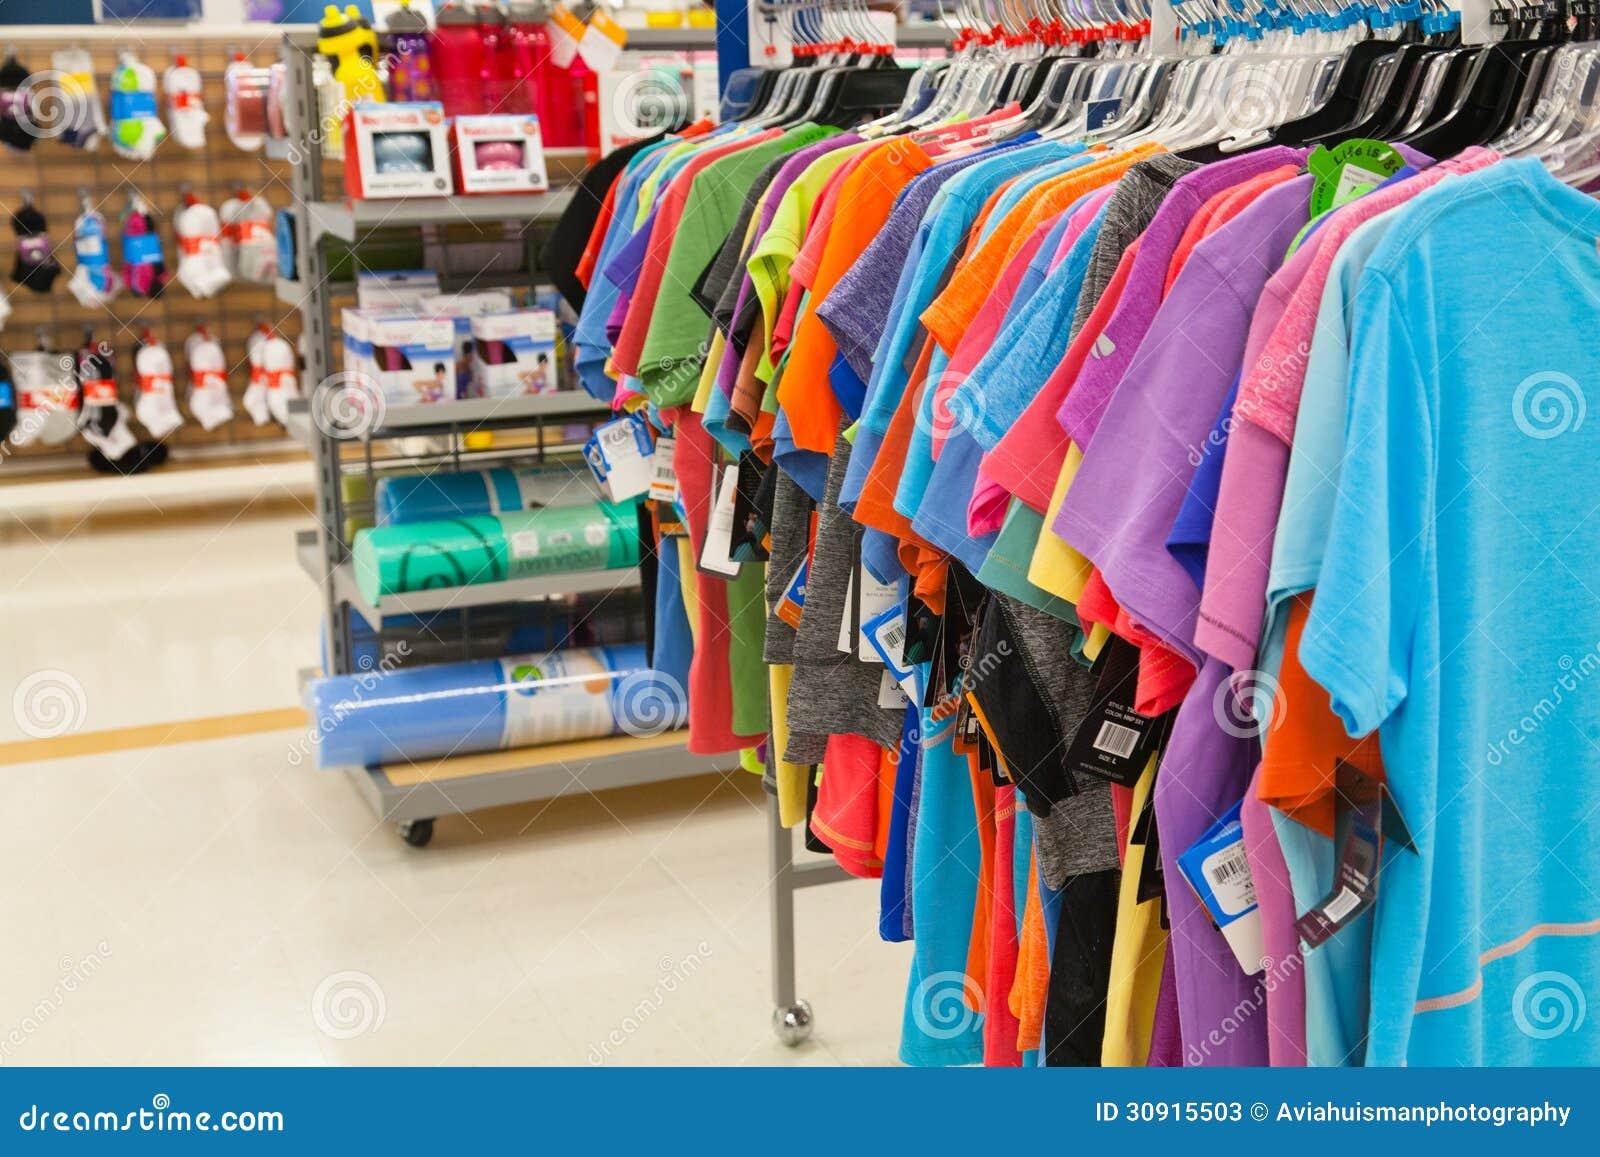 Clothes Shopping | Women's Clothing | Men's Clothing